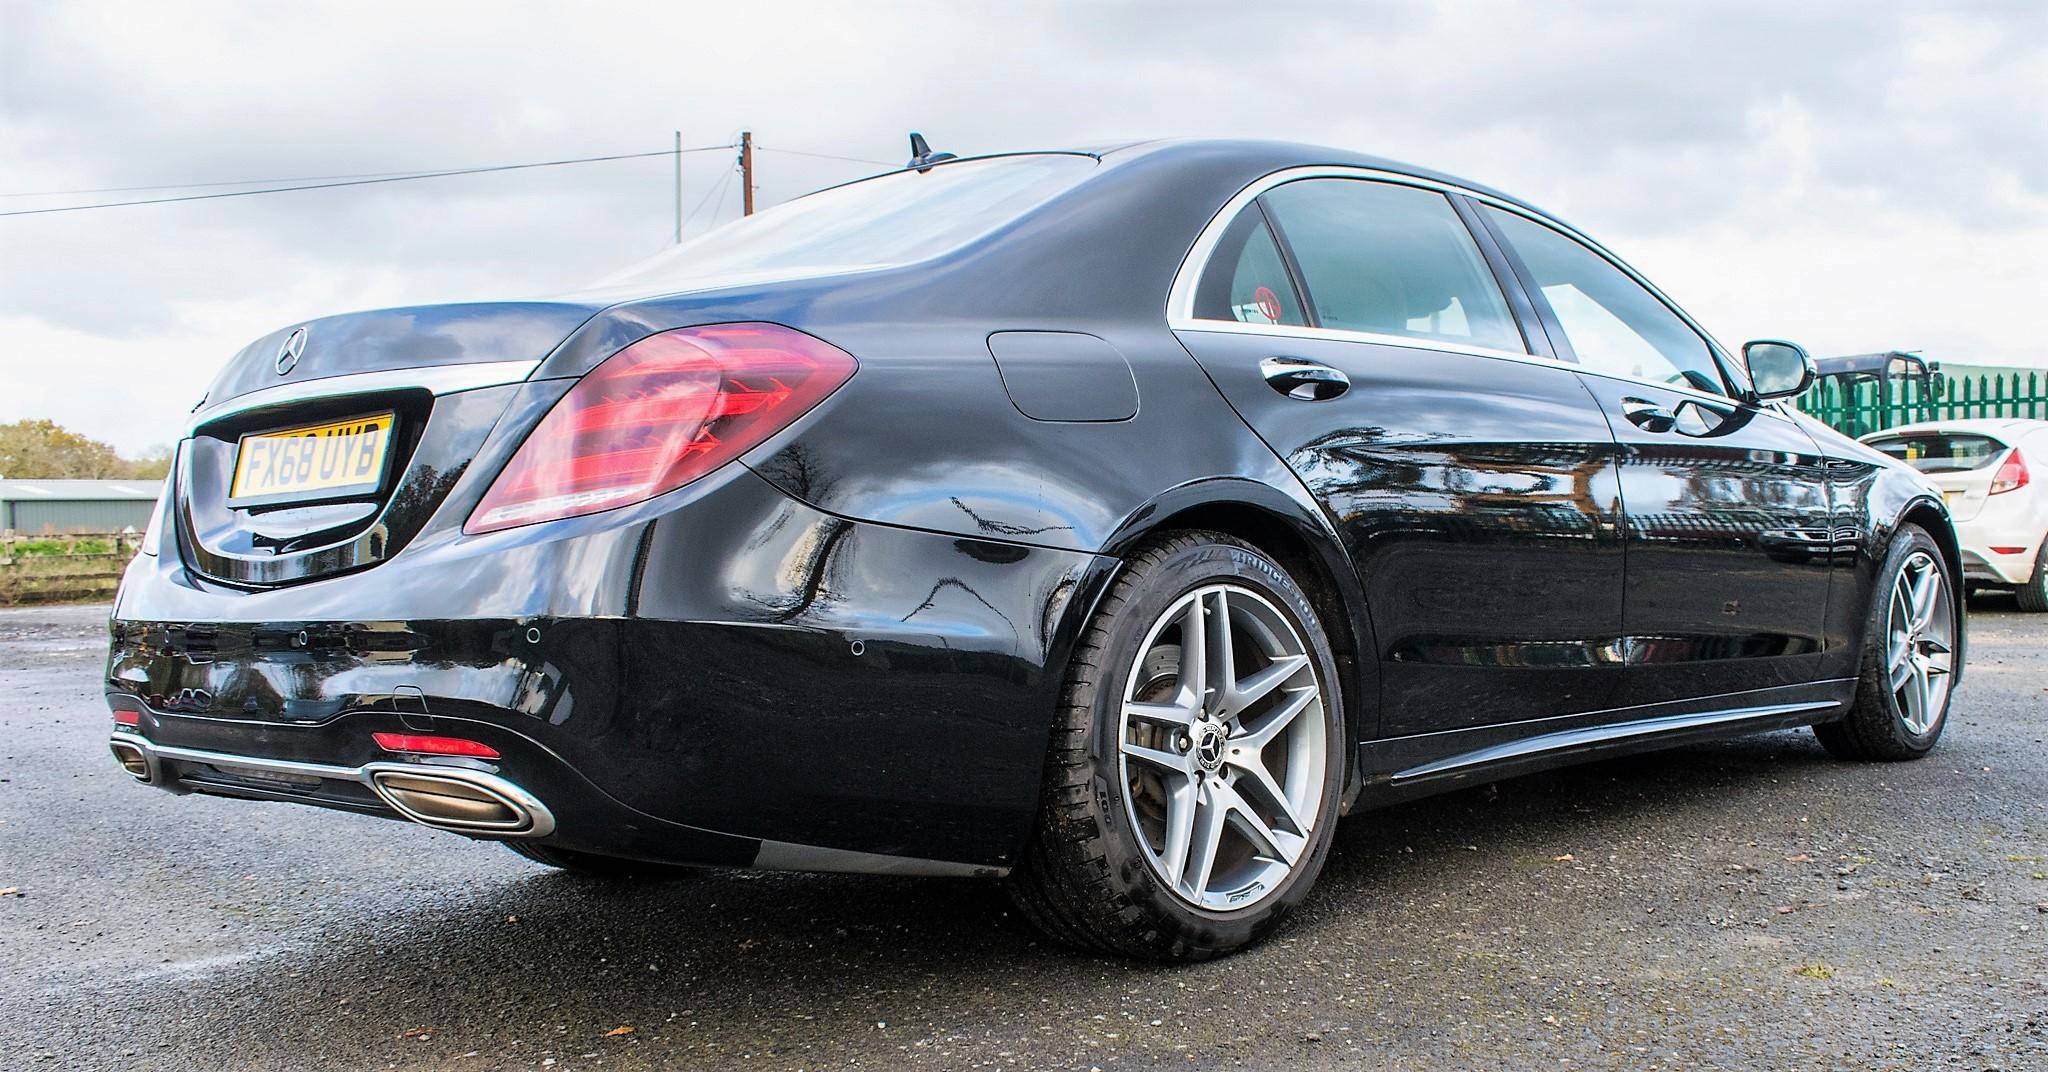 Mercedes Benz S450 L AMG Line Executive auto petrol 4 door saloon car Registration Number: FX68 - Image 3 of 33